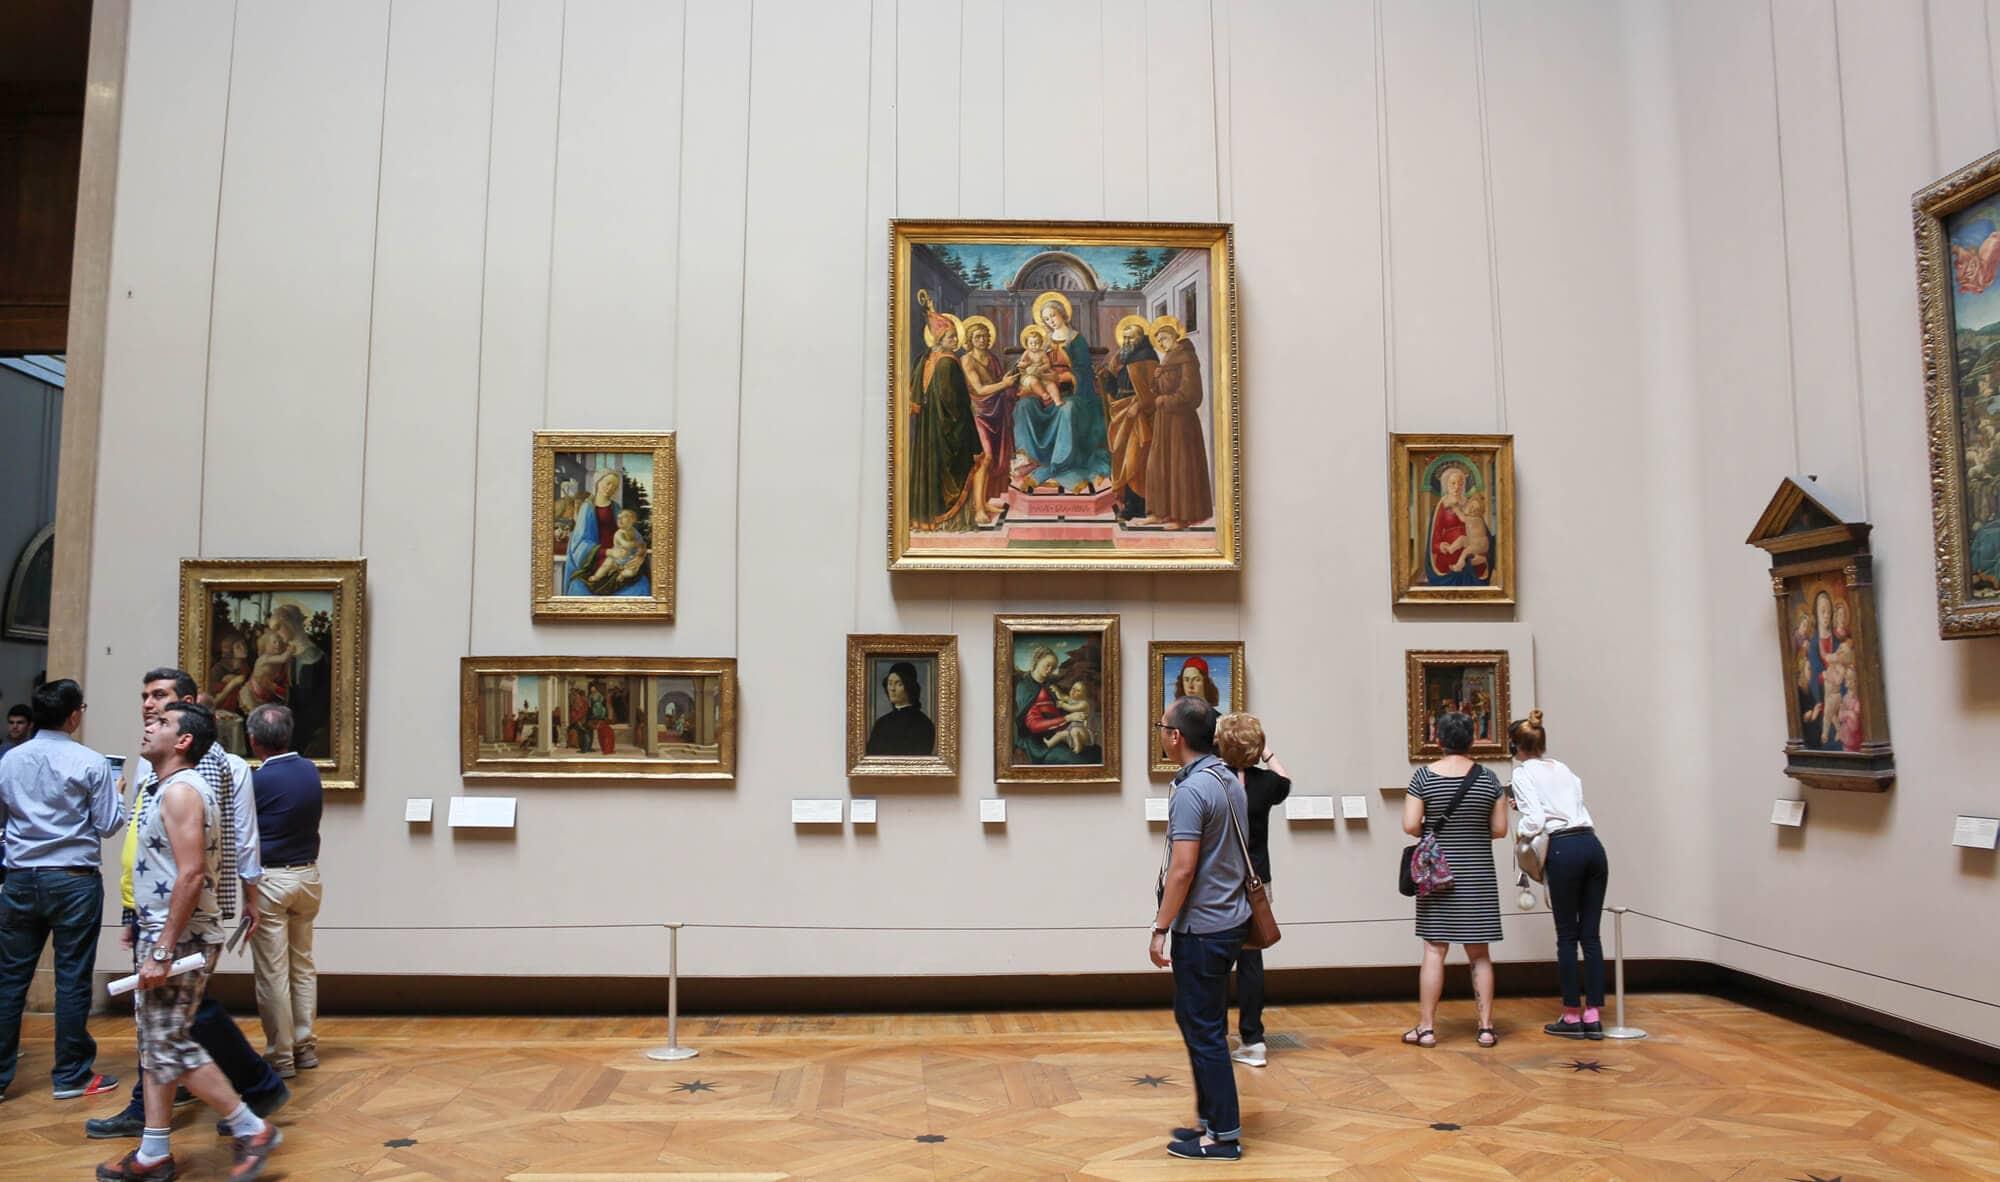 Alte Meister, Botticelli-Raum, Louvre, Paris